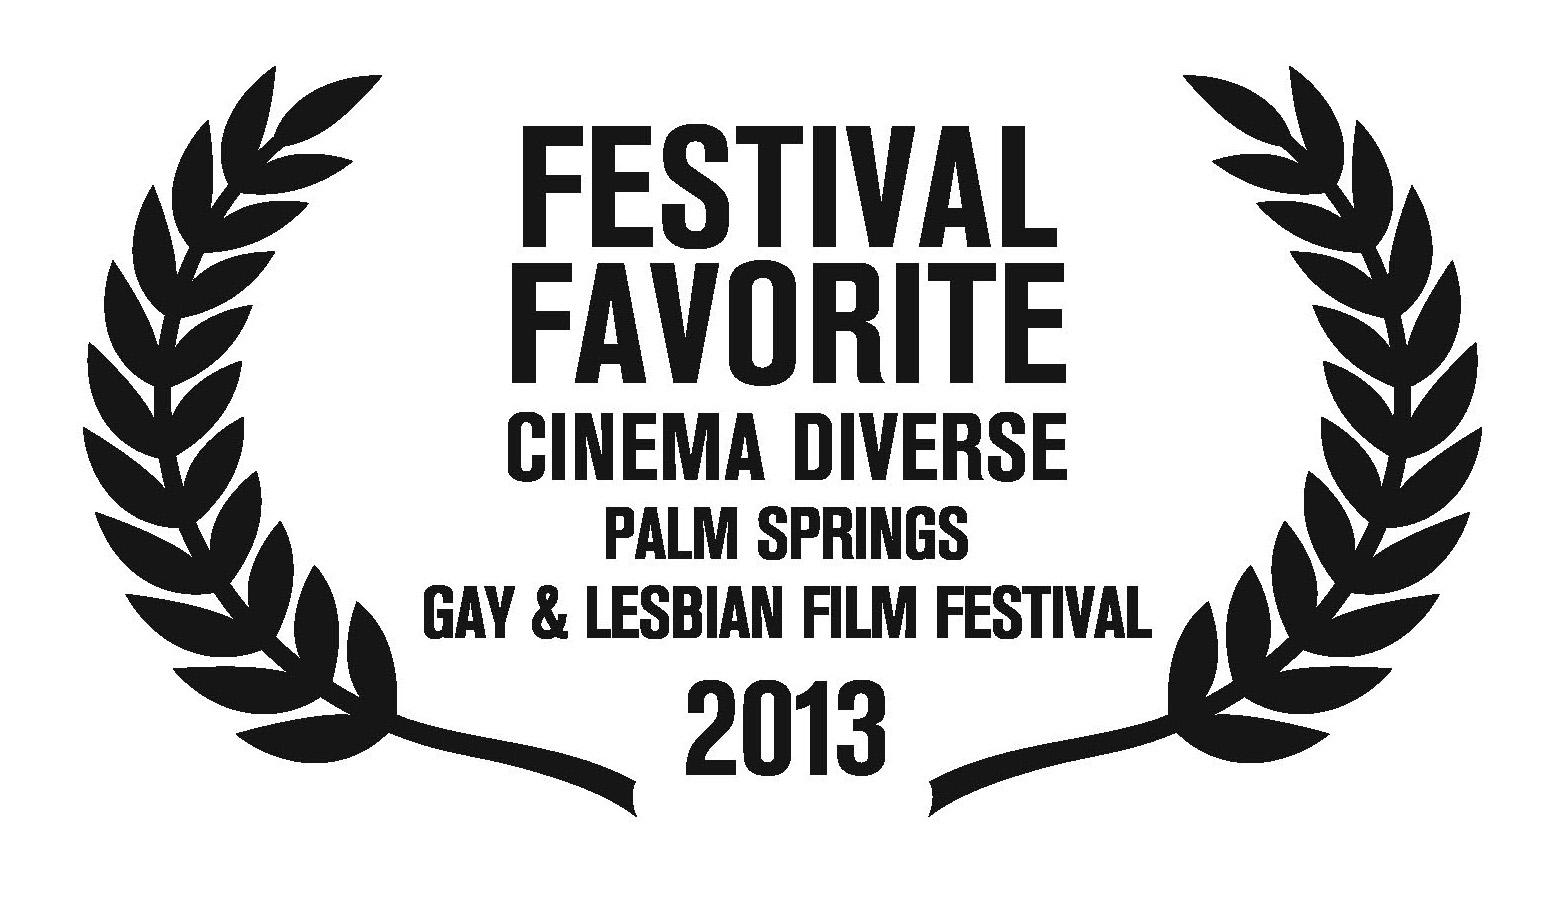 CinemaDiverse: Festival Favorite